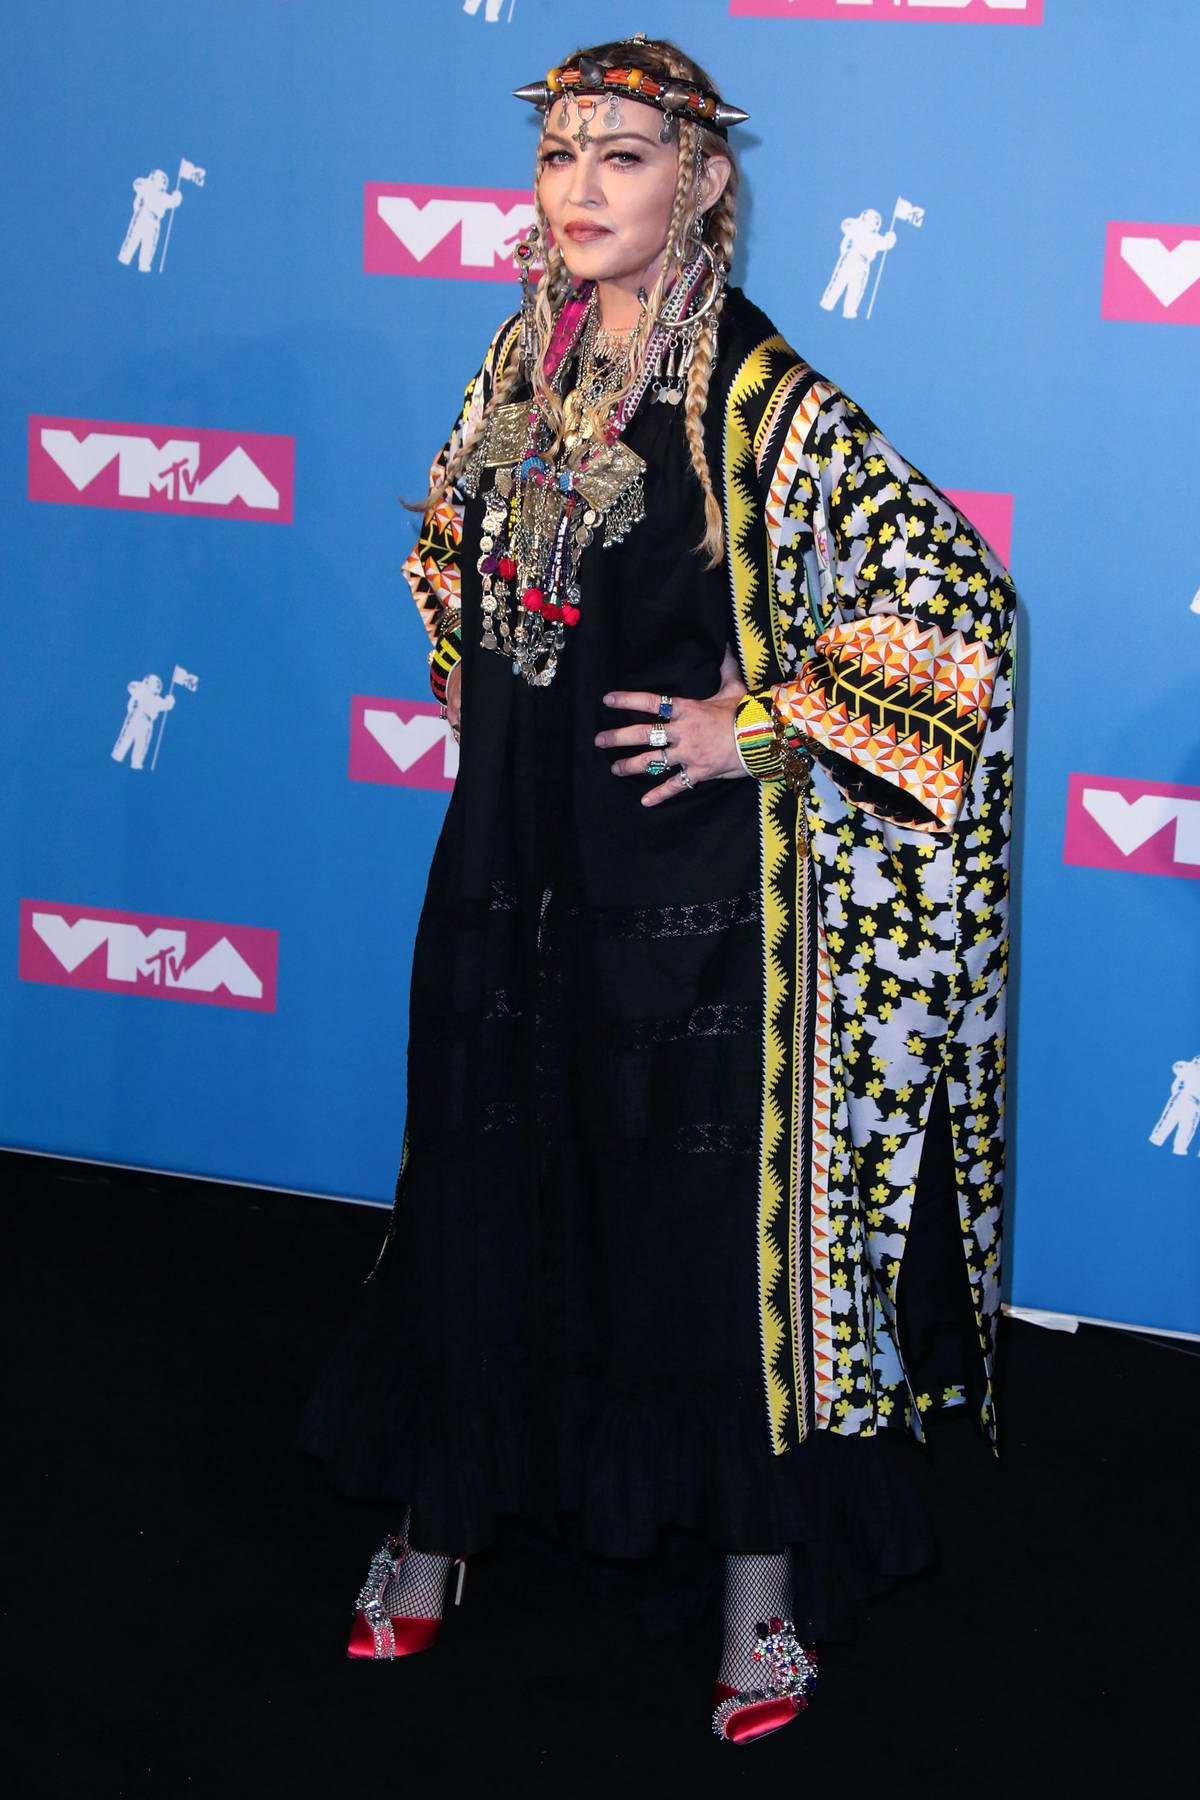 Madonna Attends 2018 Mtv Video Music Awards Mtv Vma 2018 At Radio City Music Hall In New York City 200818 2